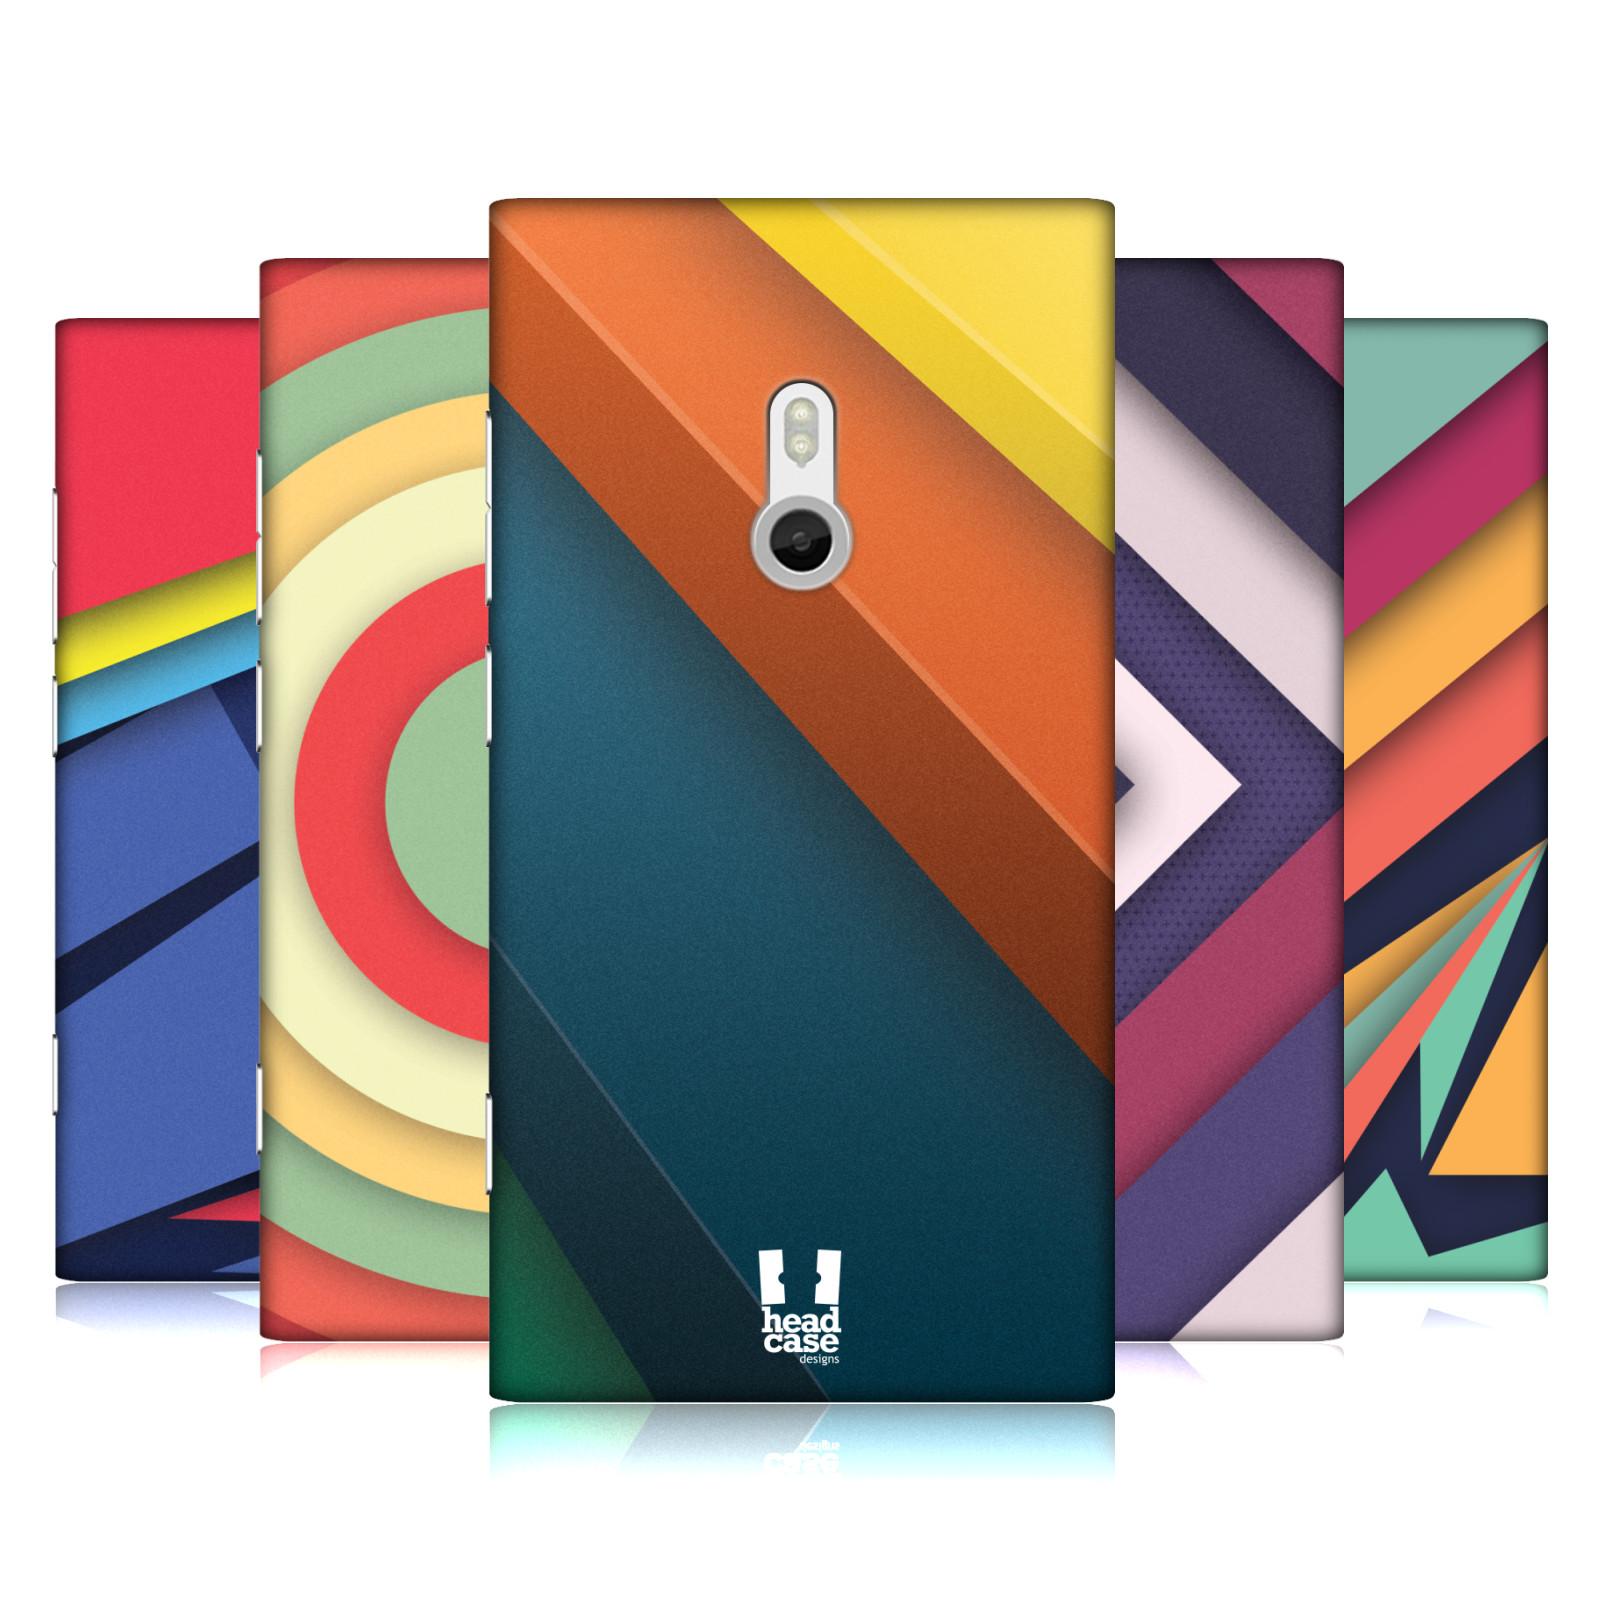 HEAD-CASE-DESIGNS-COLOURFUL-PAPER-ART-HARD-BACK-CASE-FOR-NOKIA-PHONES-2